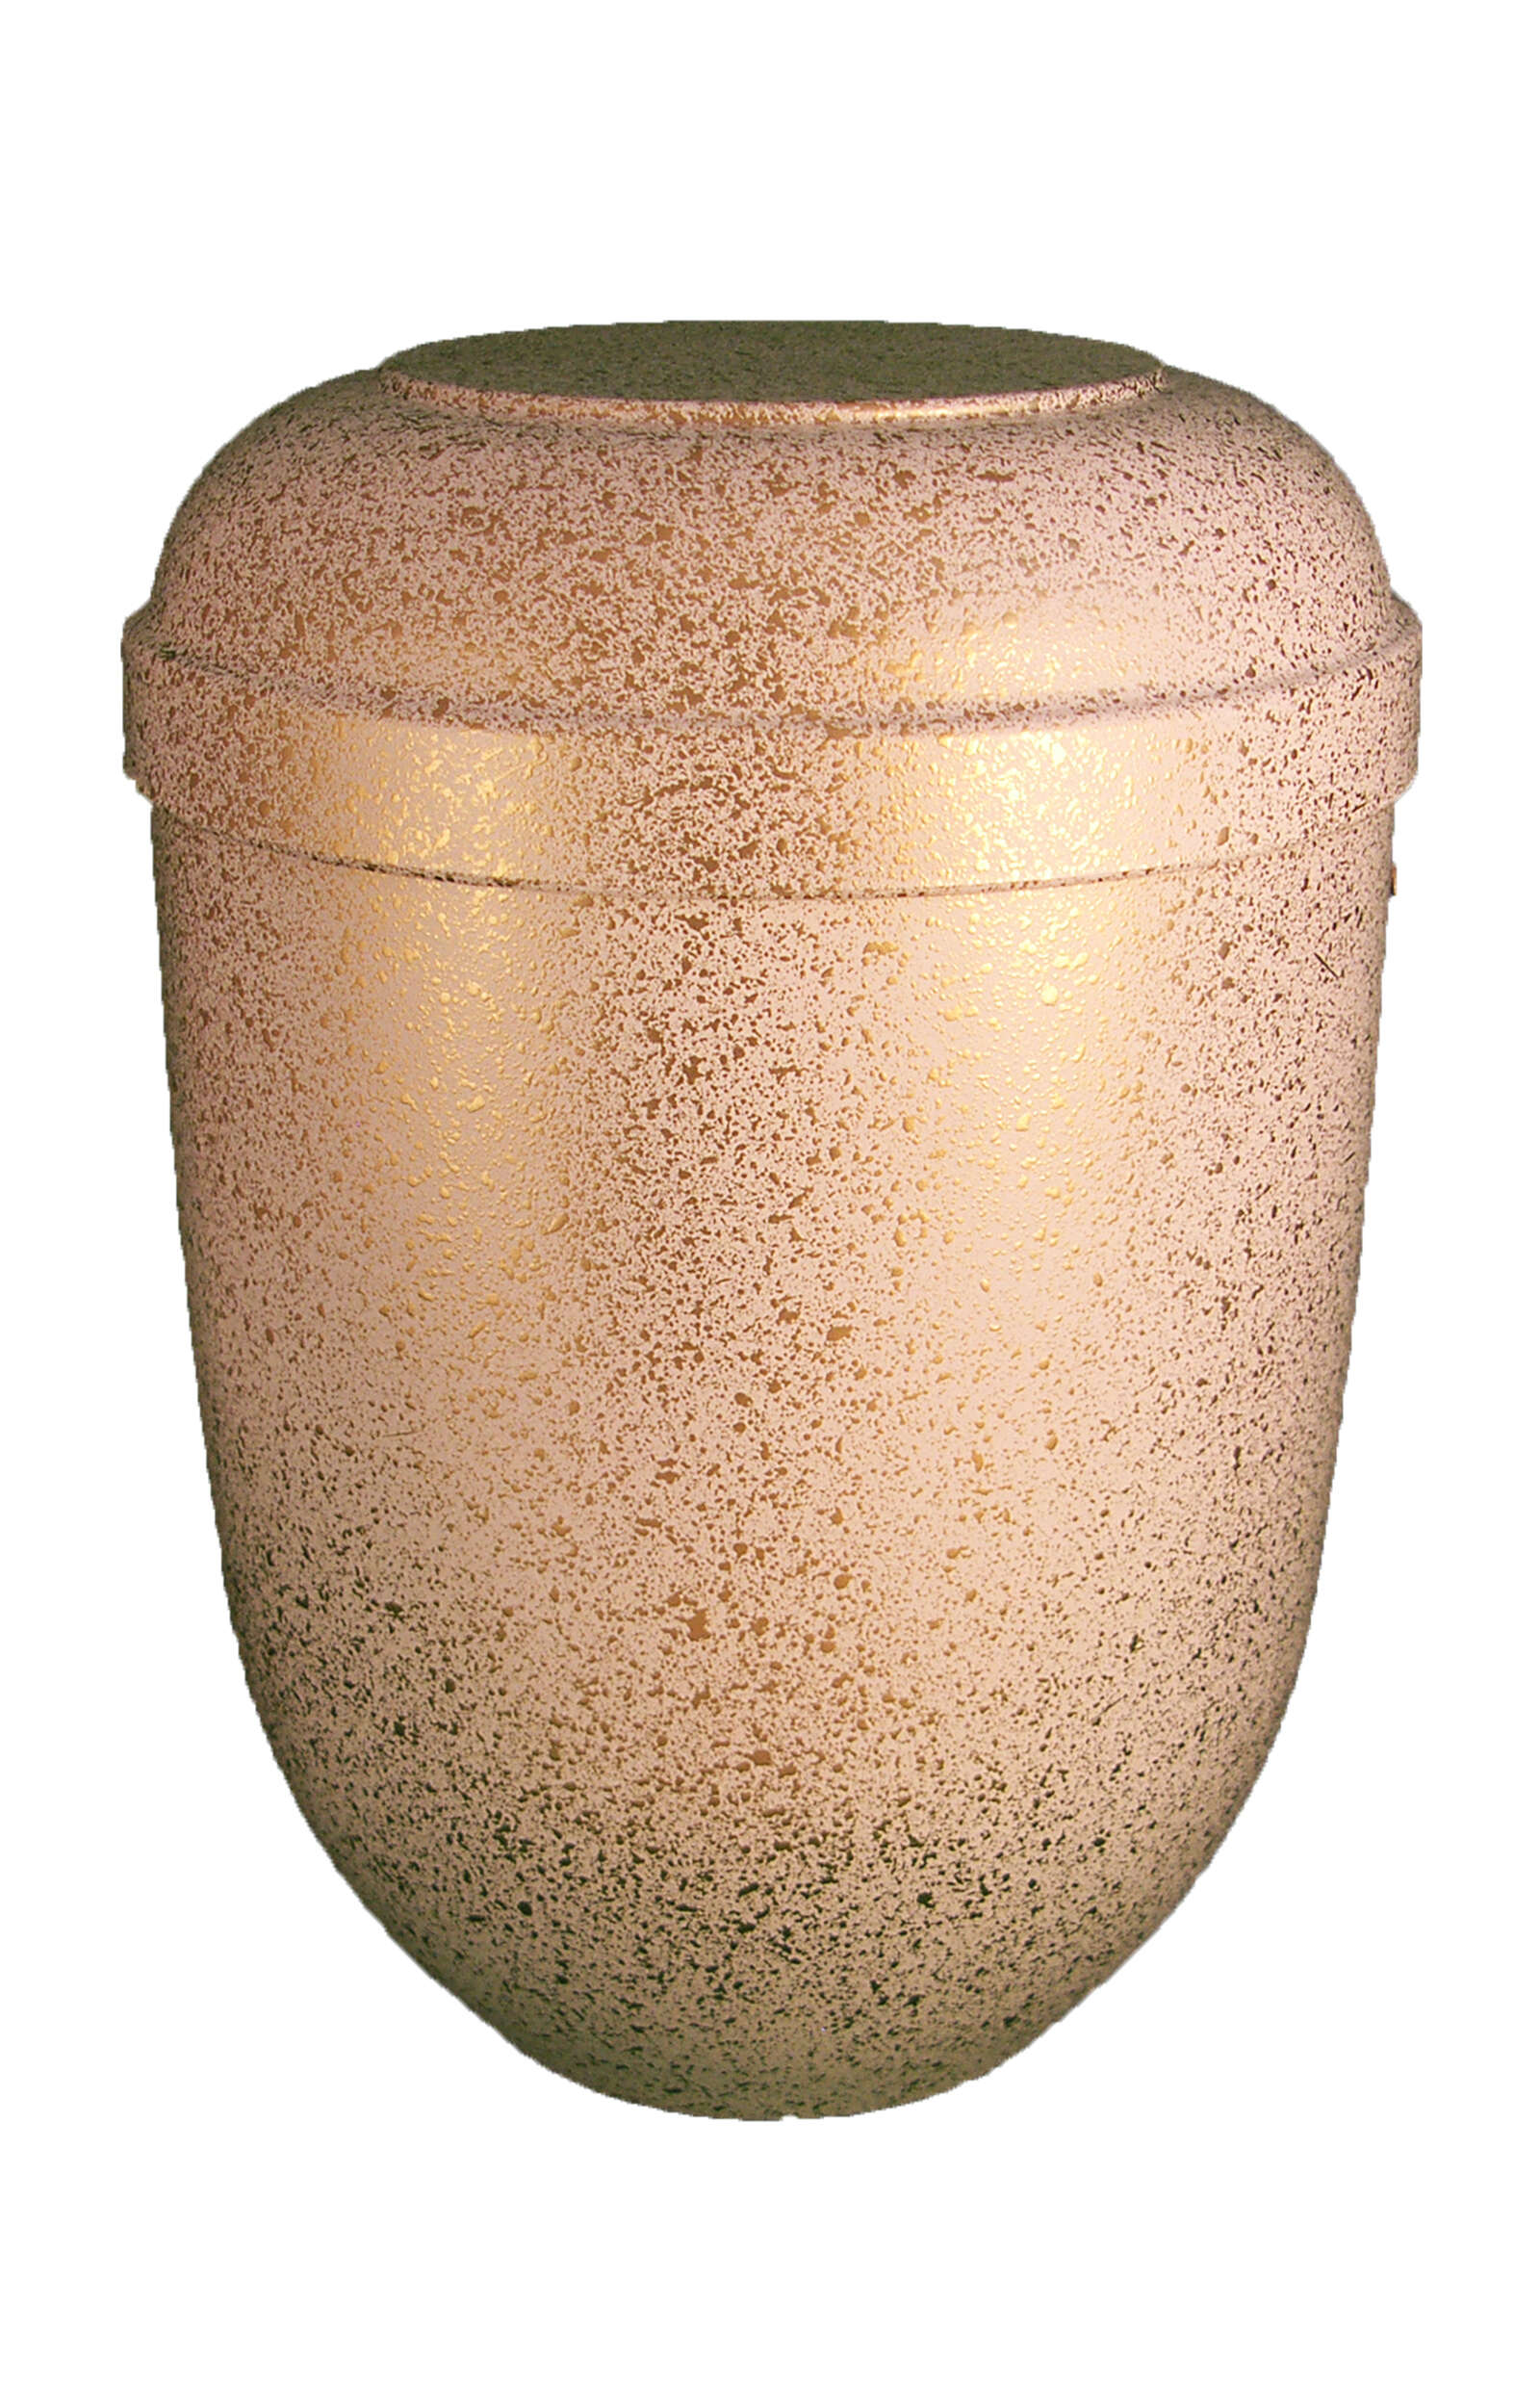 en BWG3622 funeral urns for human ashes biodegradable urn white gold mottled Glossy